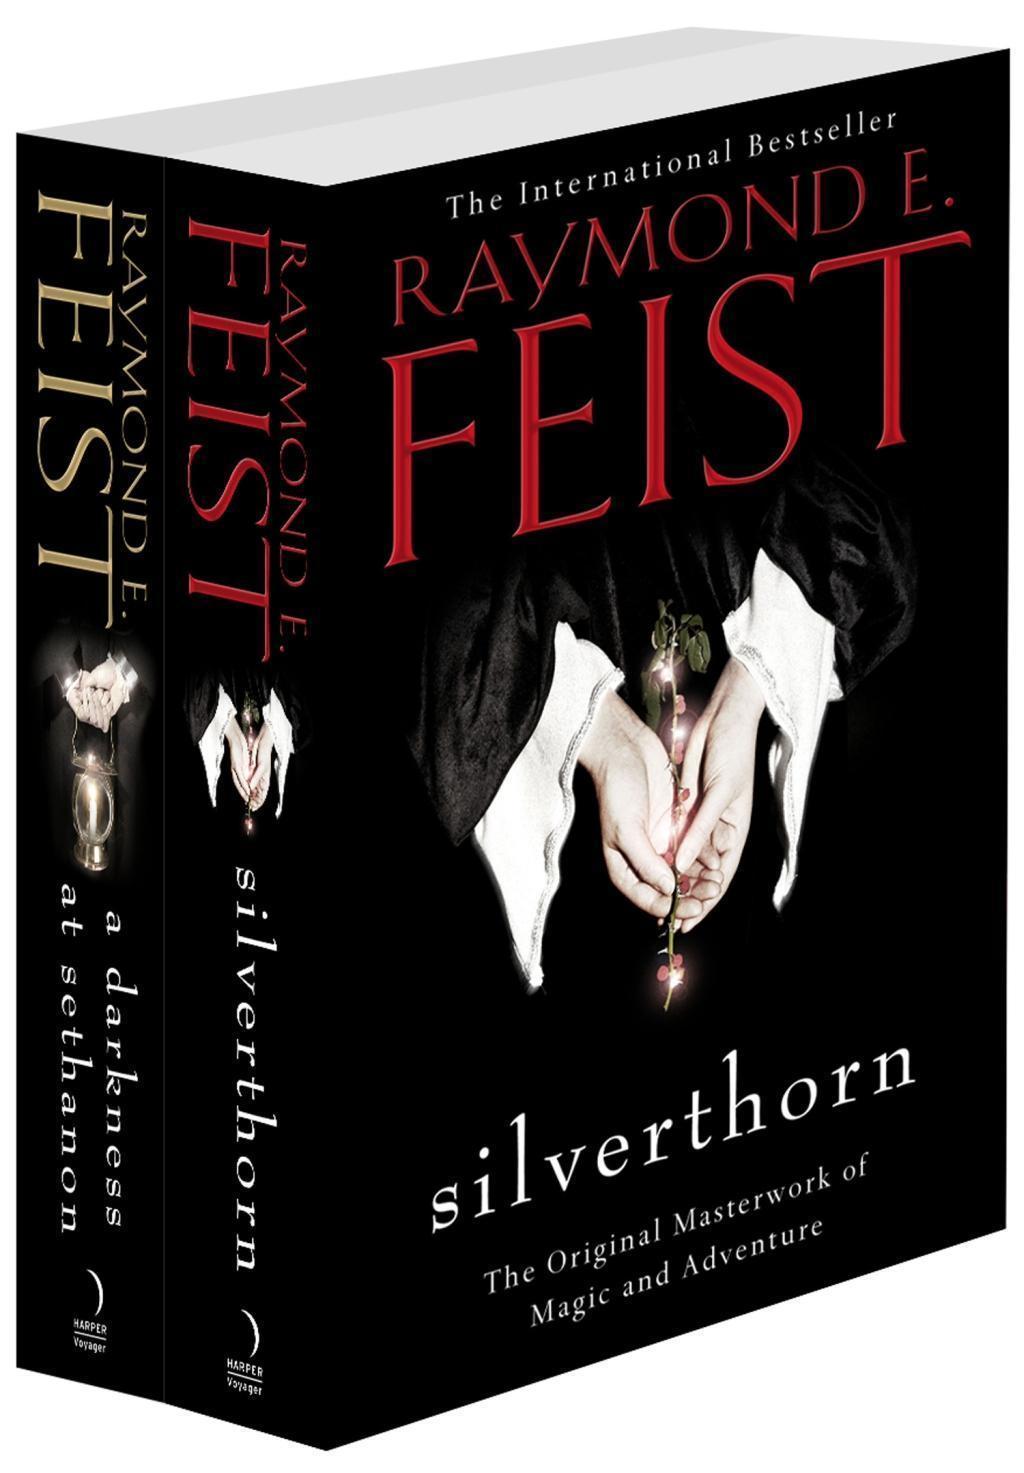 The Riftwar Saga Series Books 2 and 3: Silverthorn, A Darkness at Sethanon